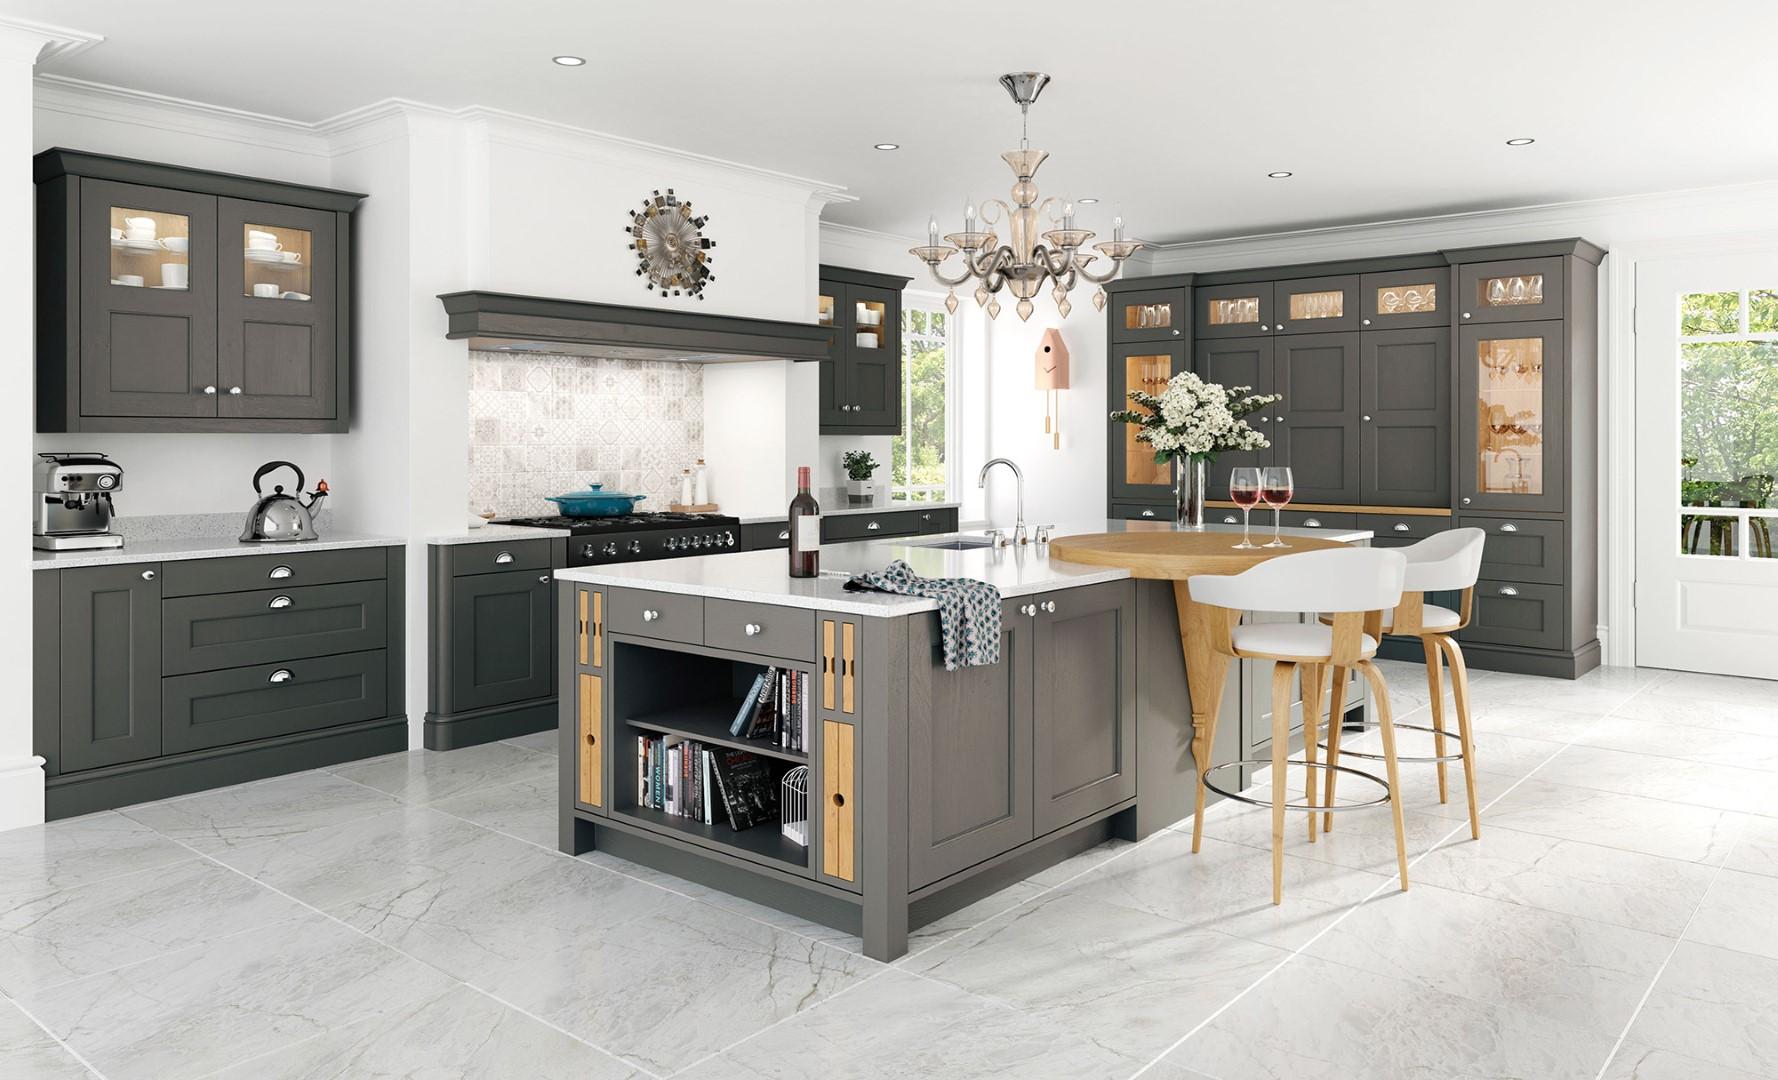 Wakefield Shaker Lava Painted Kitchen - Kitchen Design - Alan Kelly Kitchens - Waterford